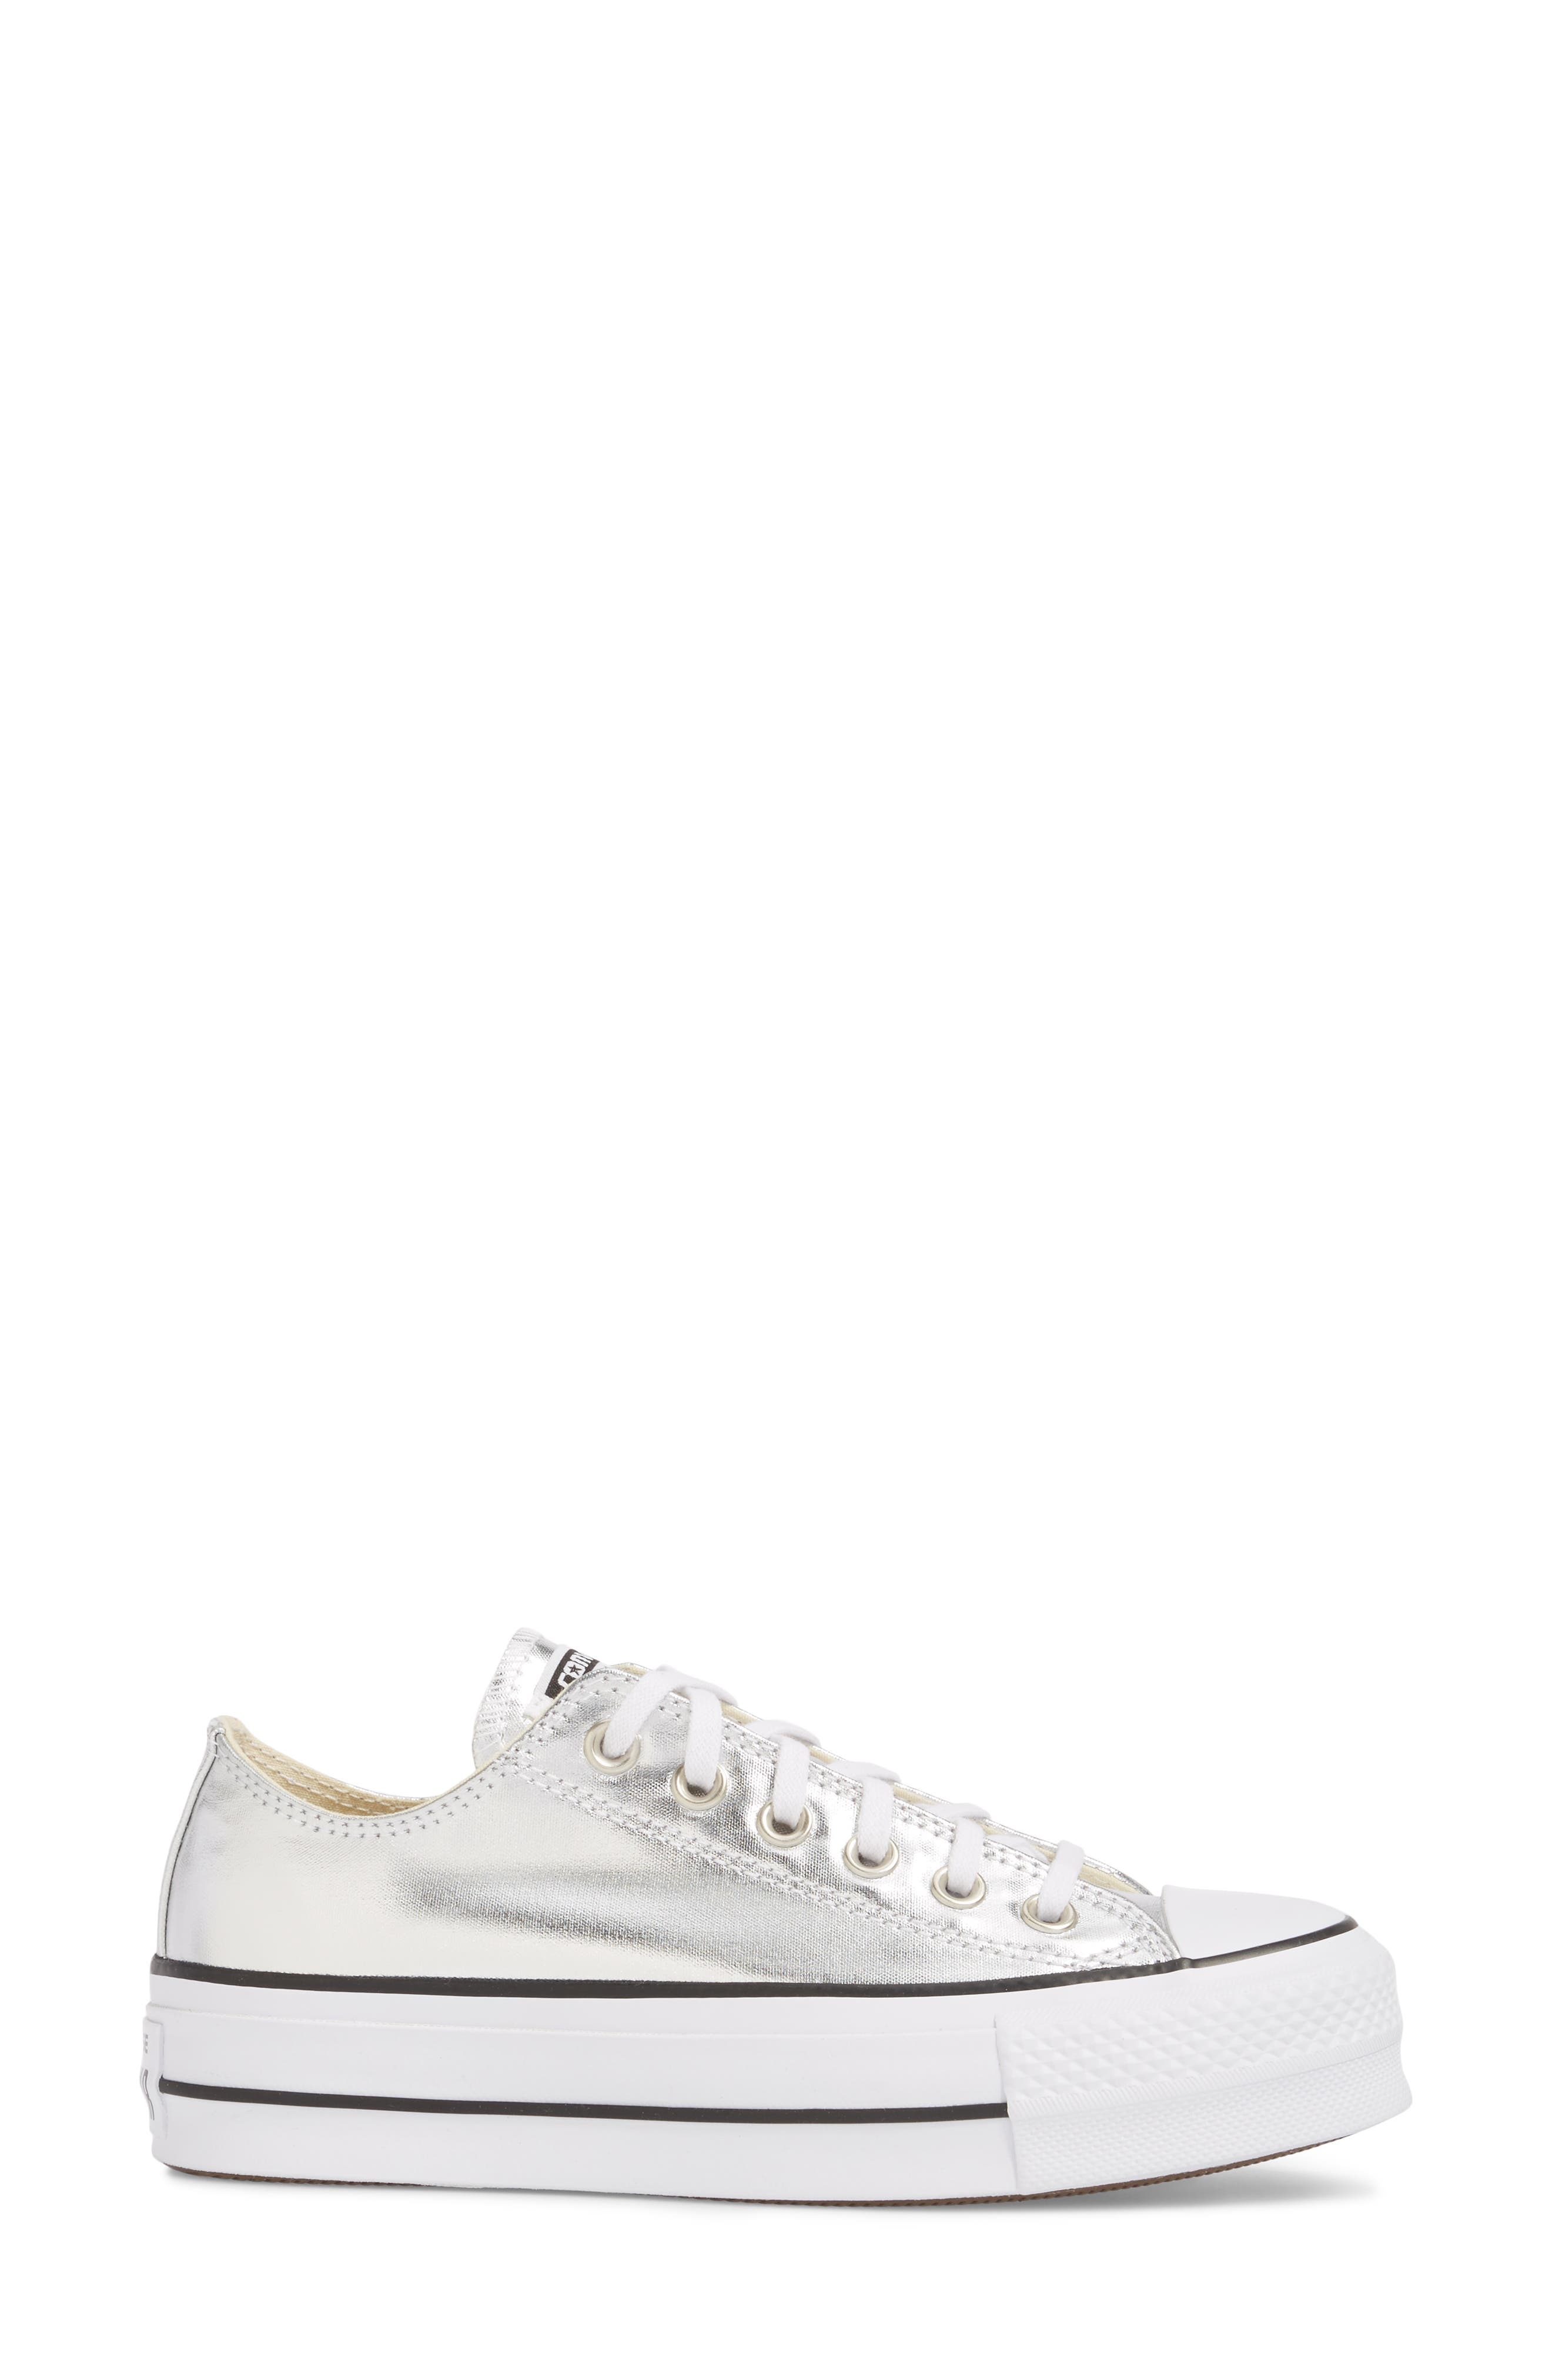 Chuck Taylor<sup>®</sup> All Star Platform Sneaker,                             Alternate thumbnail 3, color,                             Silver/ Black